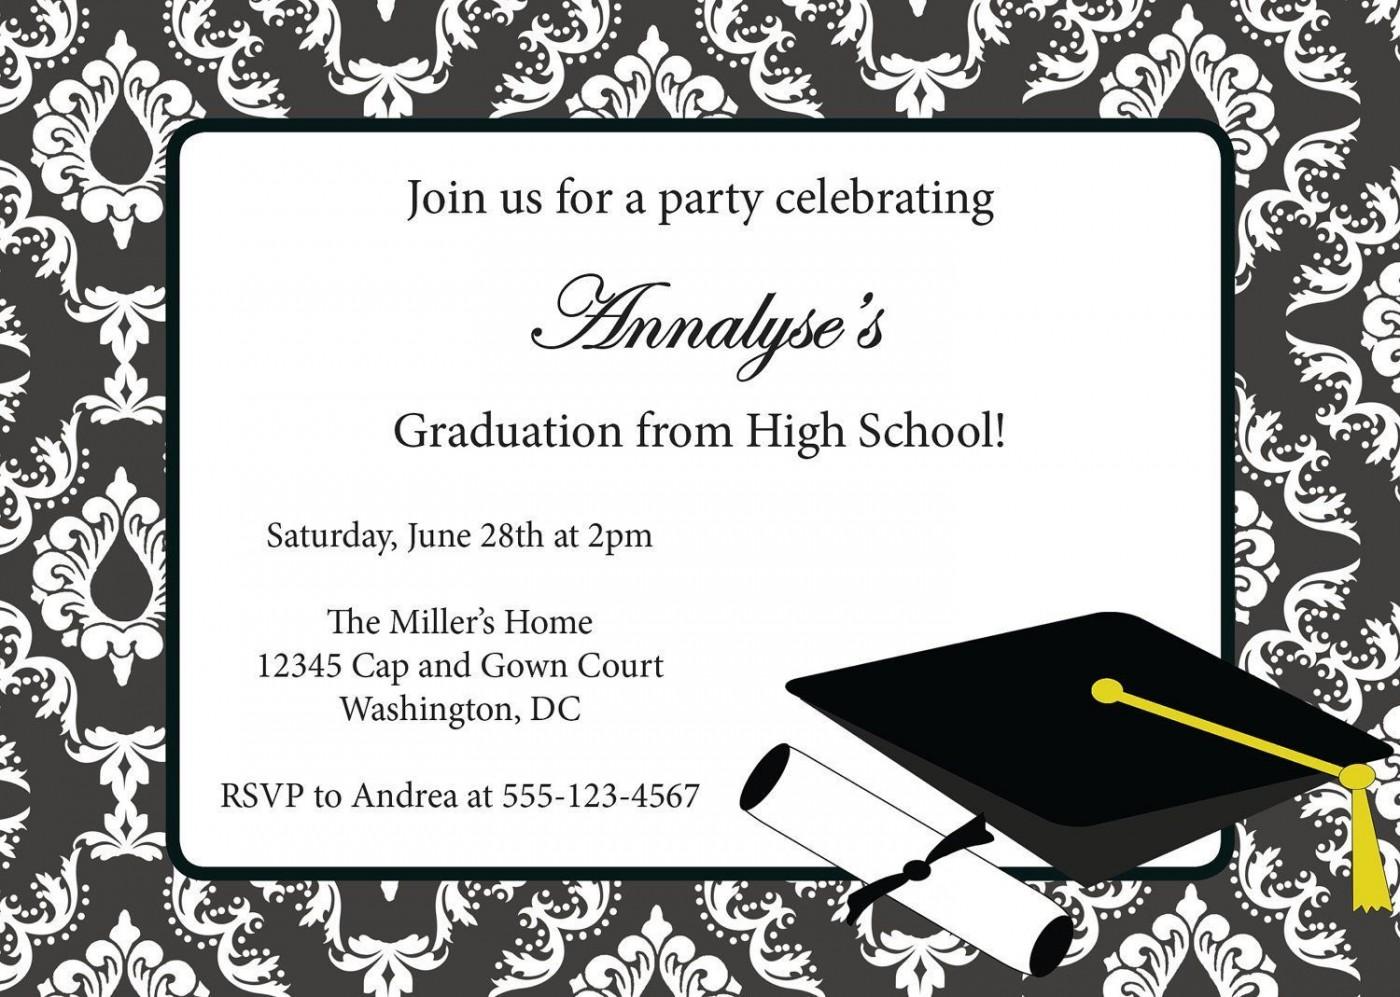 003 Stupendou Free Graduation Invitation Template Printable Picture  Kindergarten Party Card1400